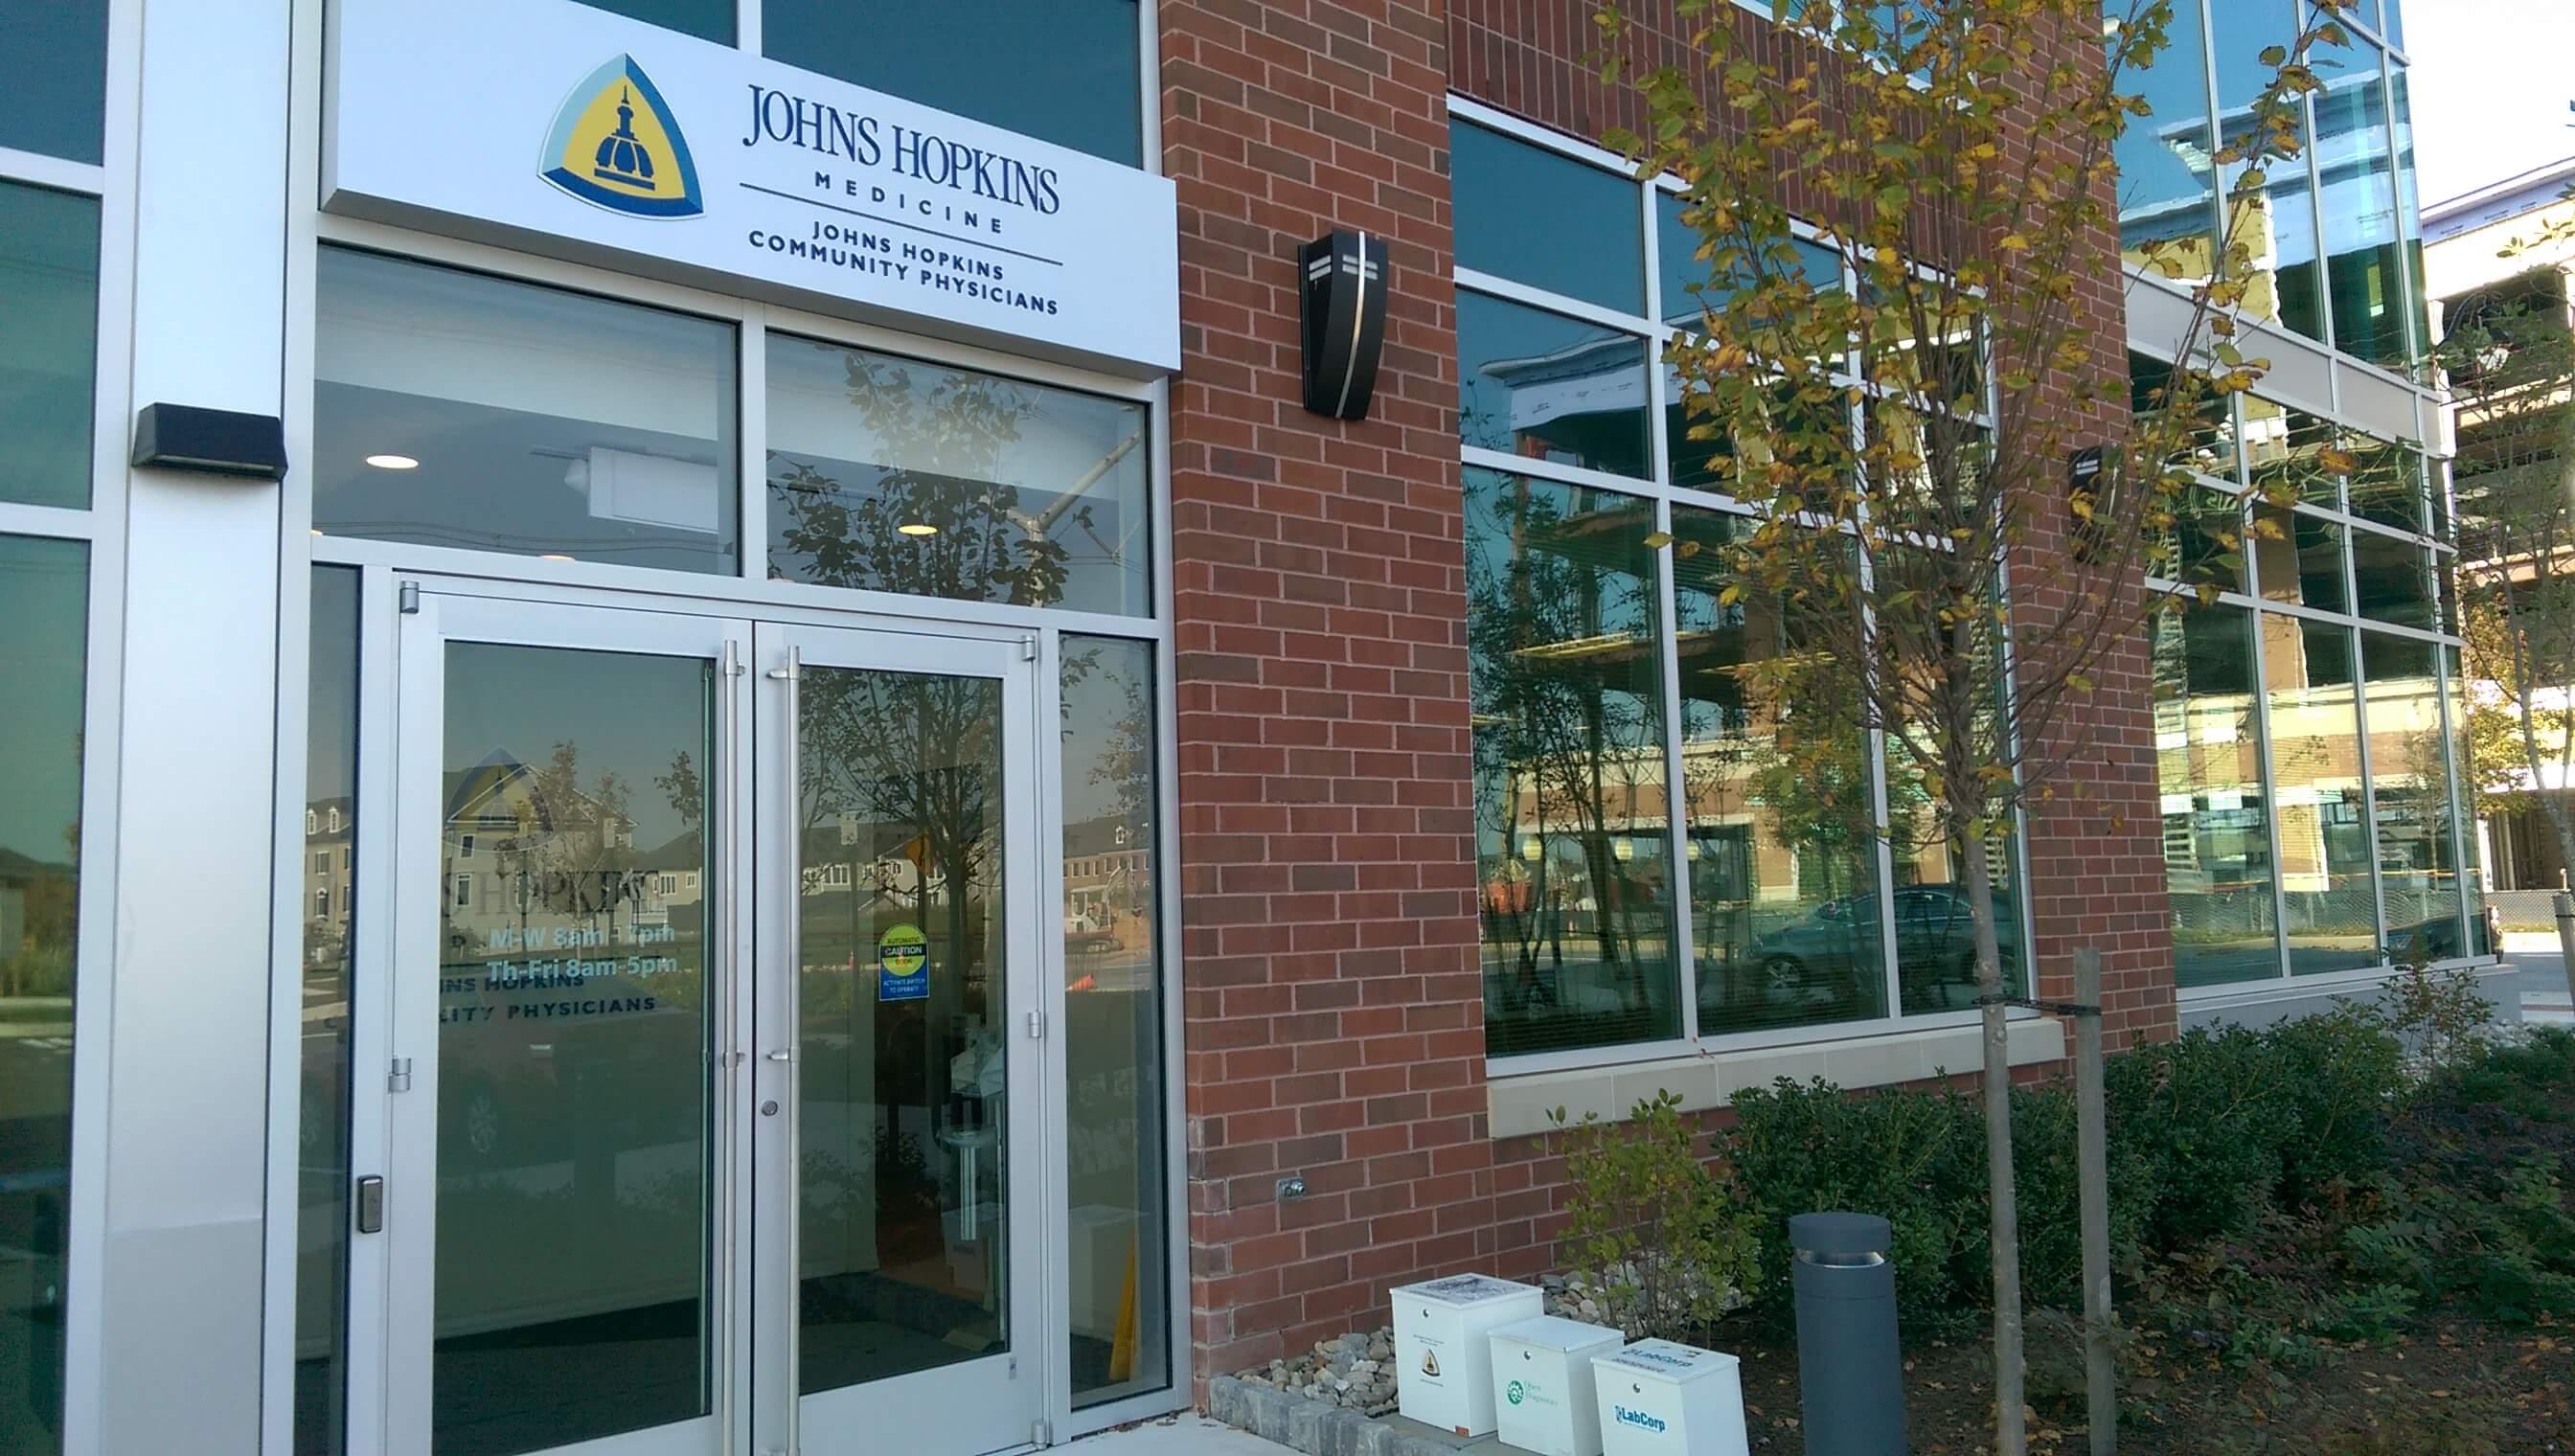 Image of medical center